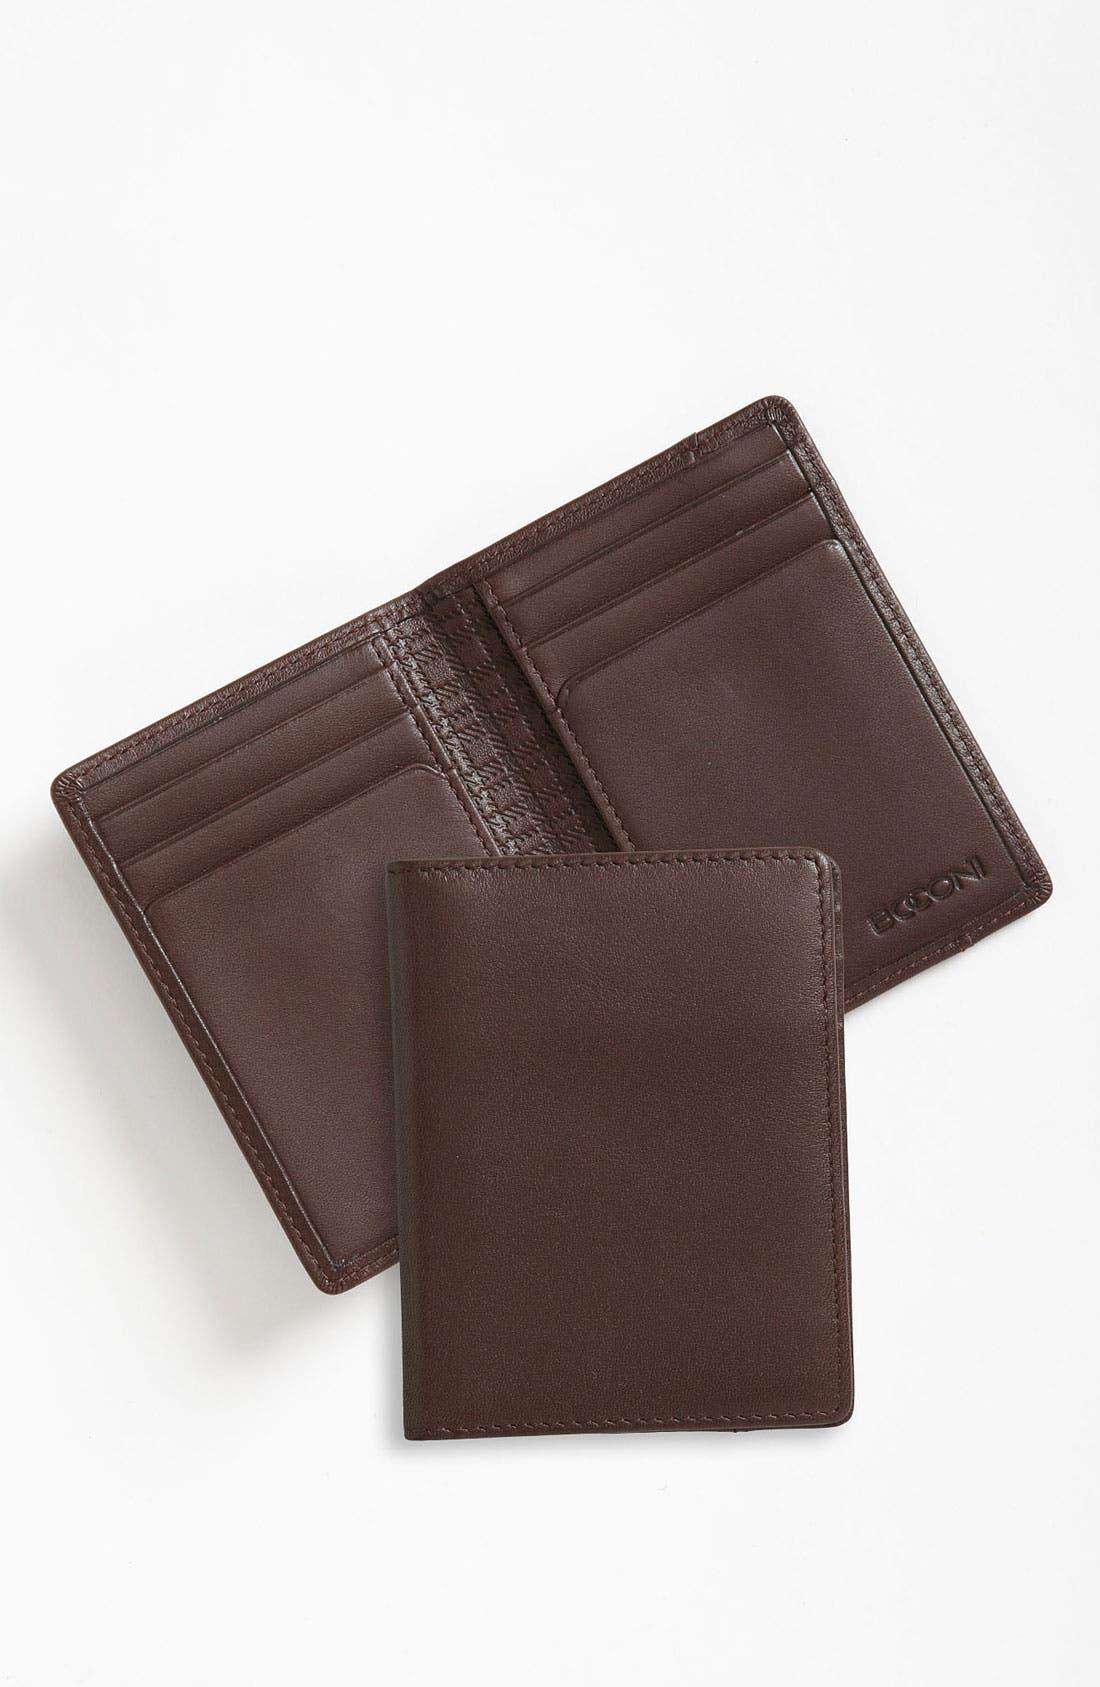 Alternate Image 1 Selected - Boconi 'Collins' Wallet